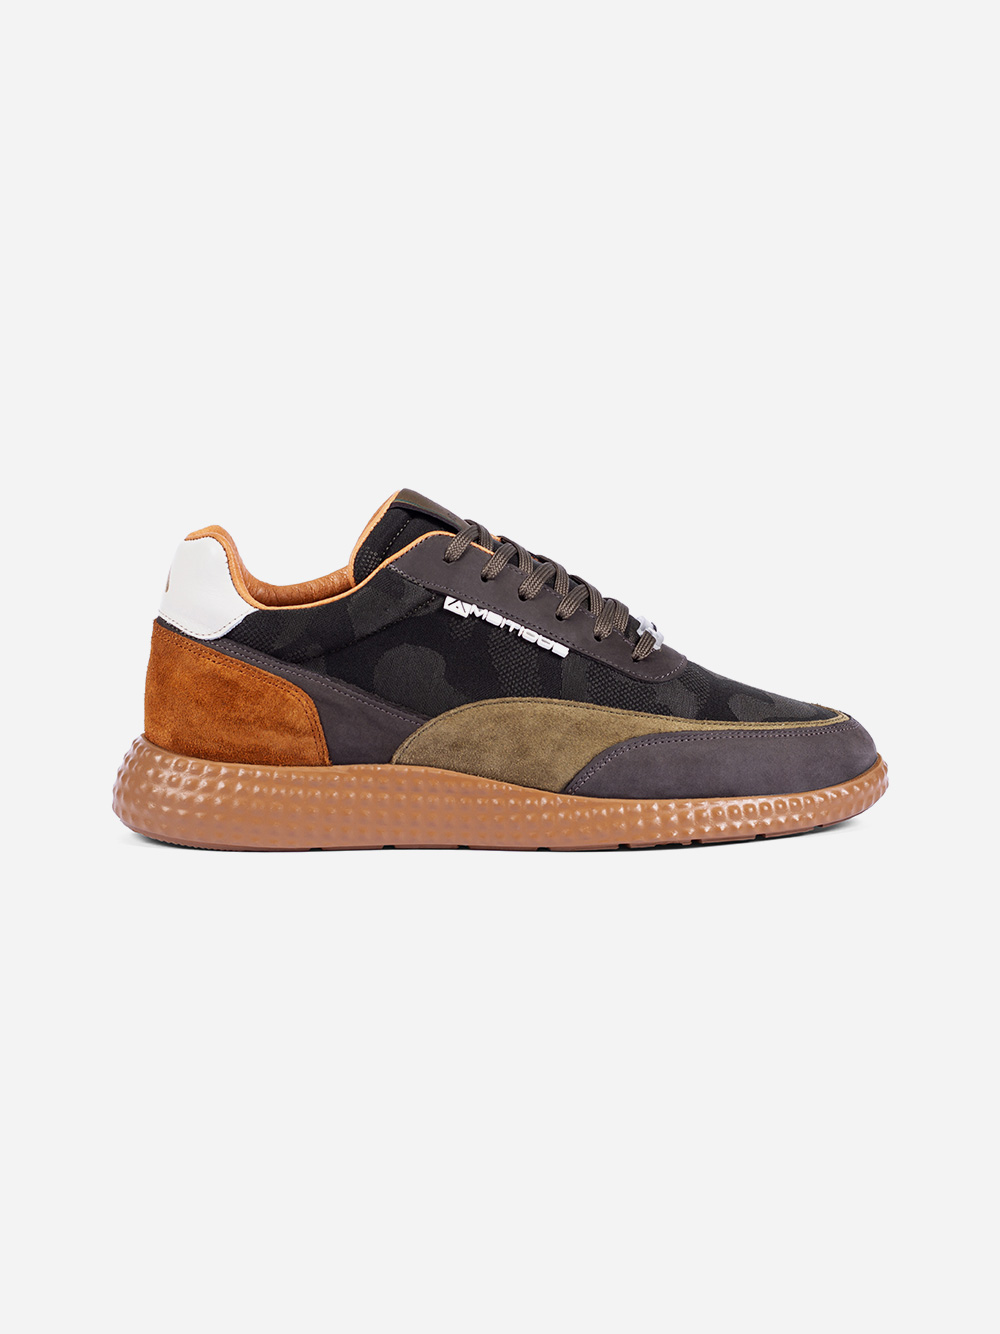 Kaki Leather Sneakers